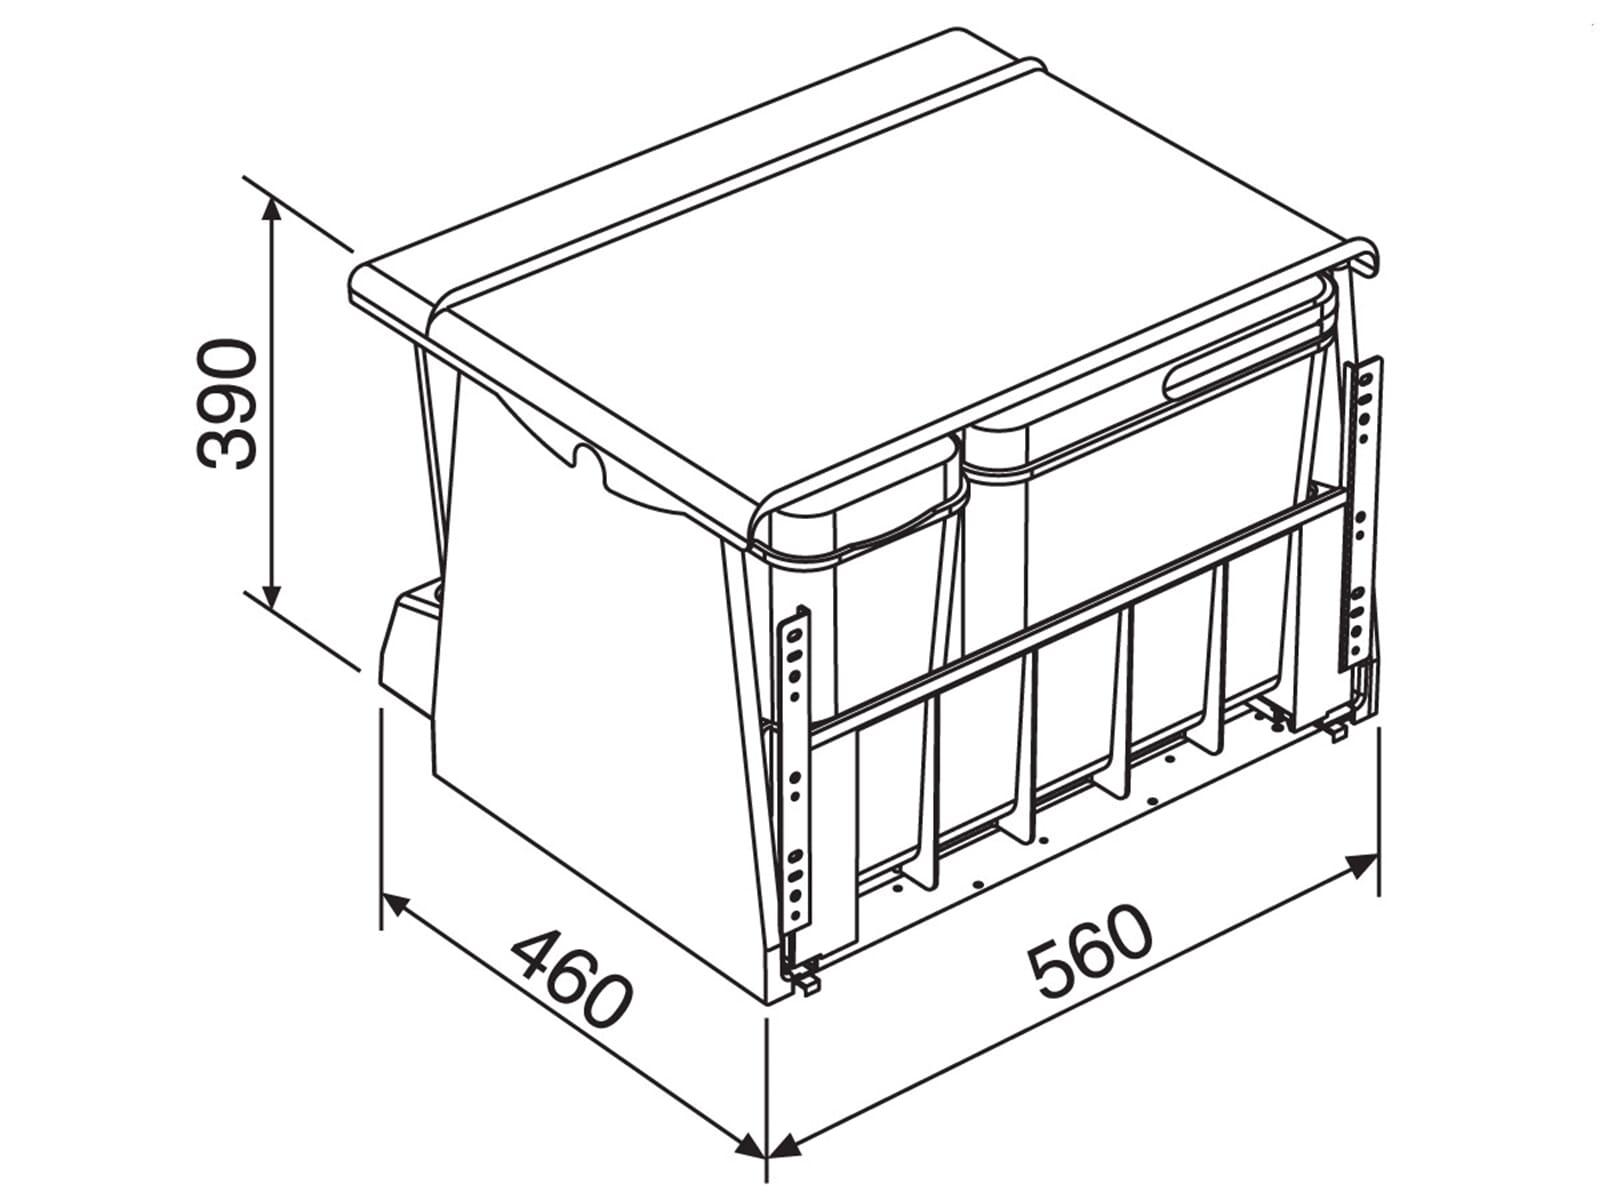 Franke Sorter 700-60 KickMatic - 121.0173.362 Einbau Abfallsammler